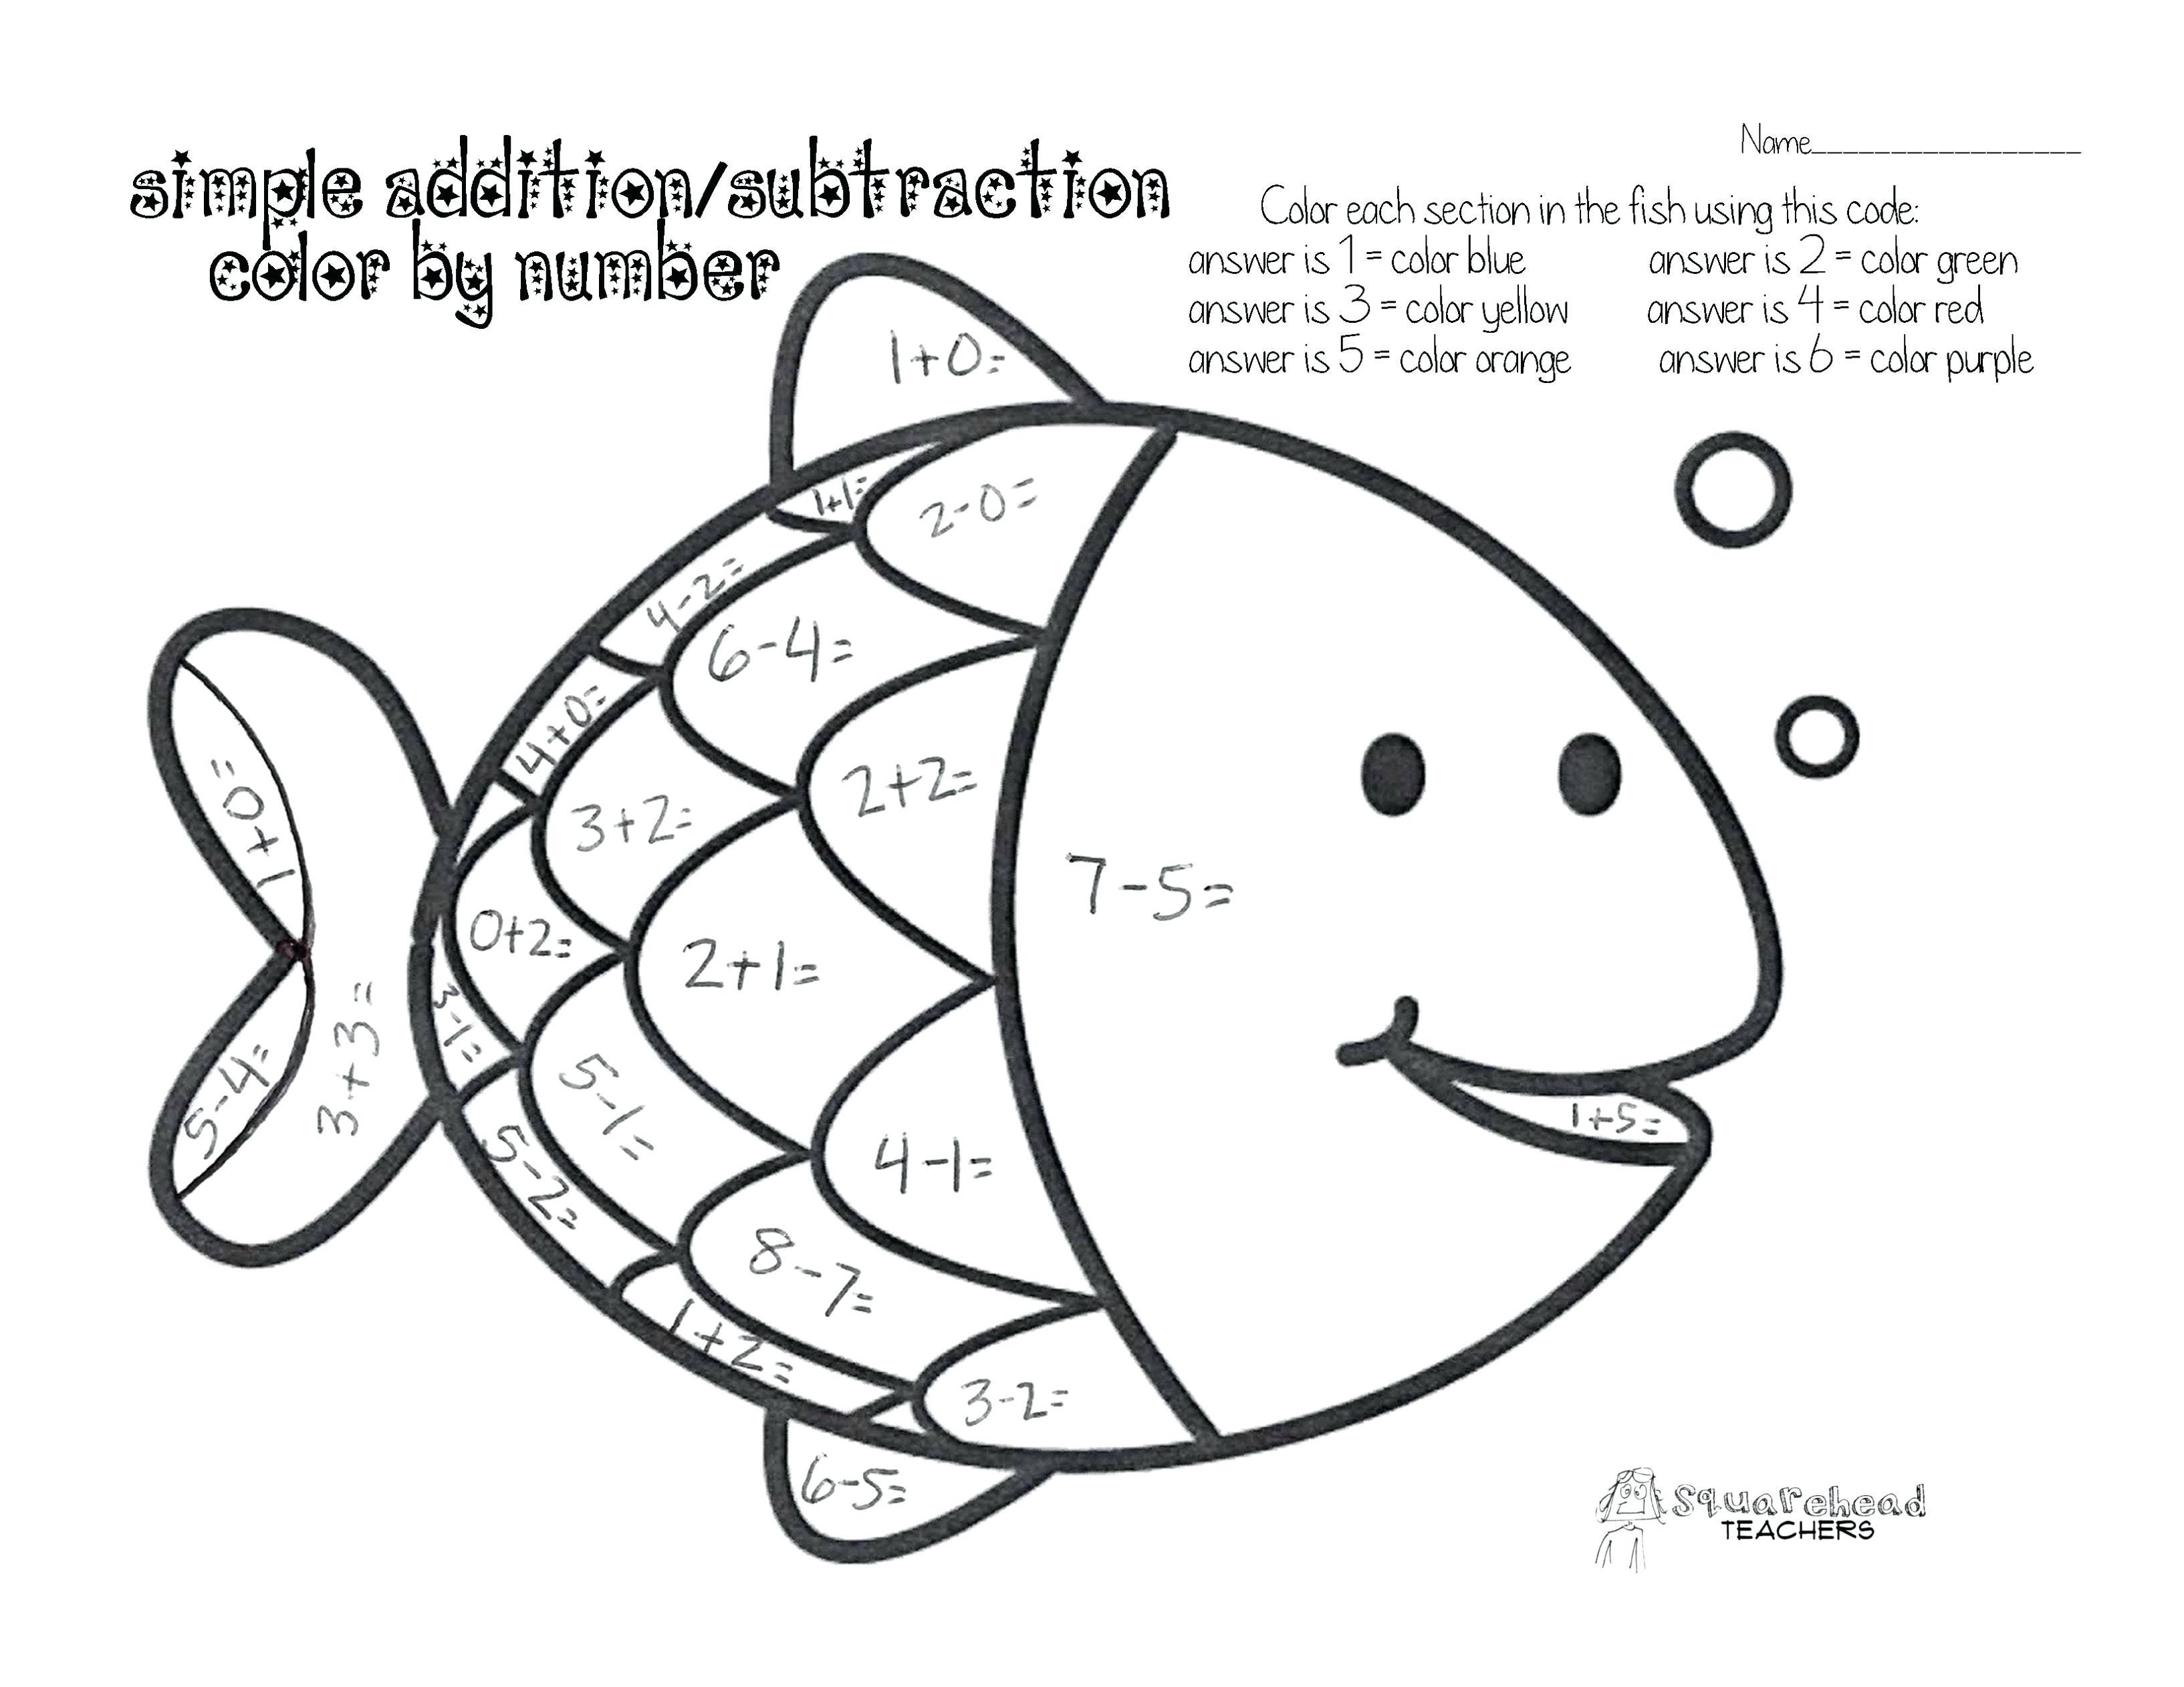 Coloring: Math Coloring Worksheets 1St Grade. Math Coloring - Free Printable Math Coloring Sheets